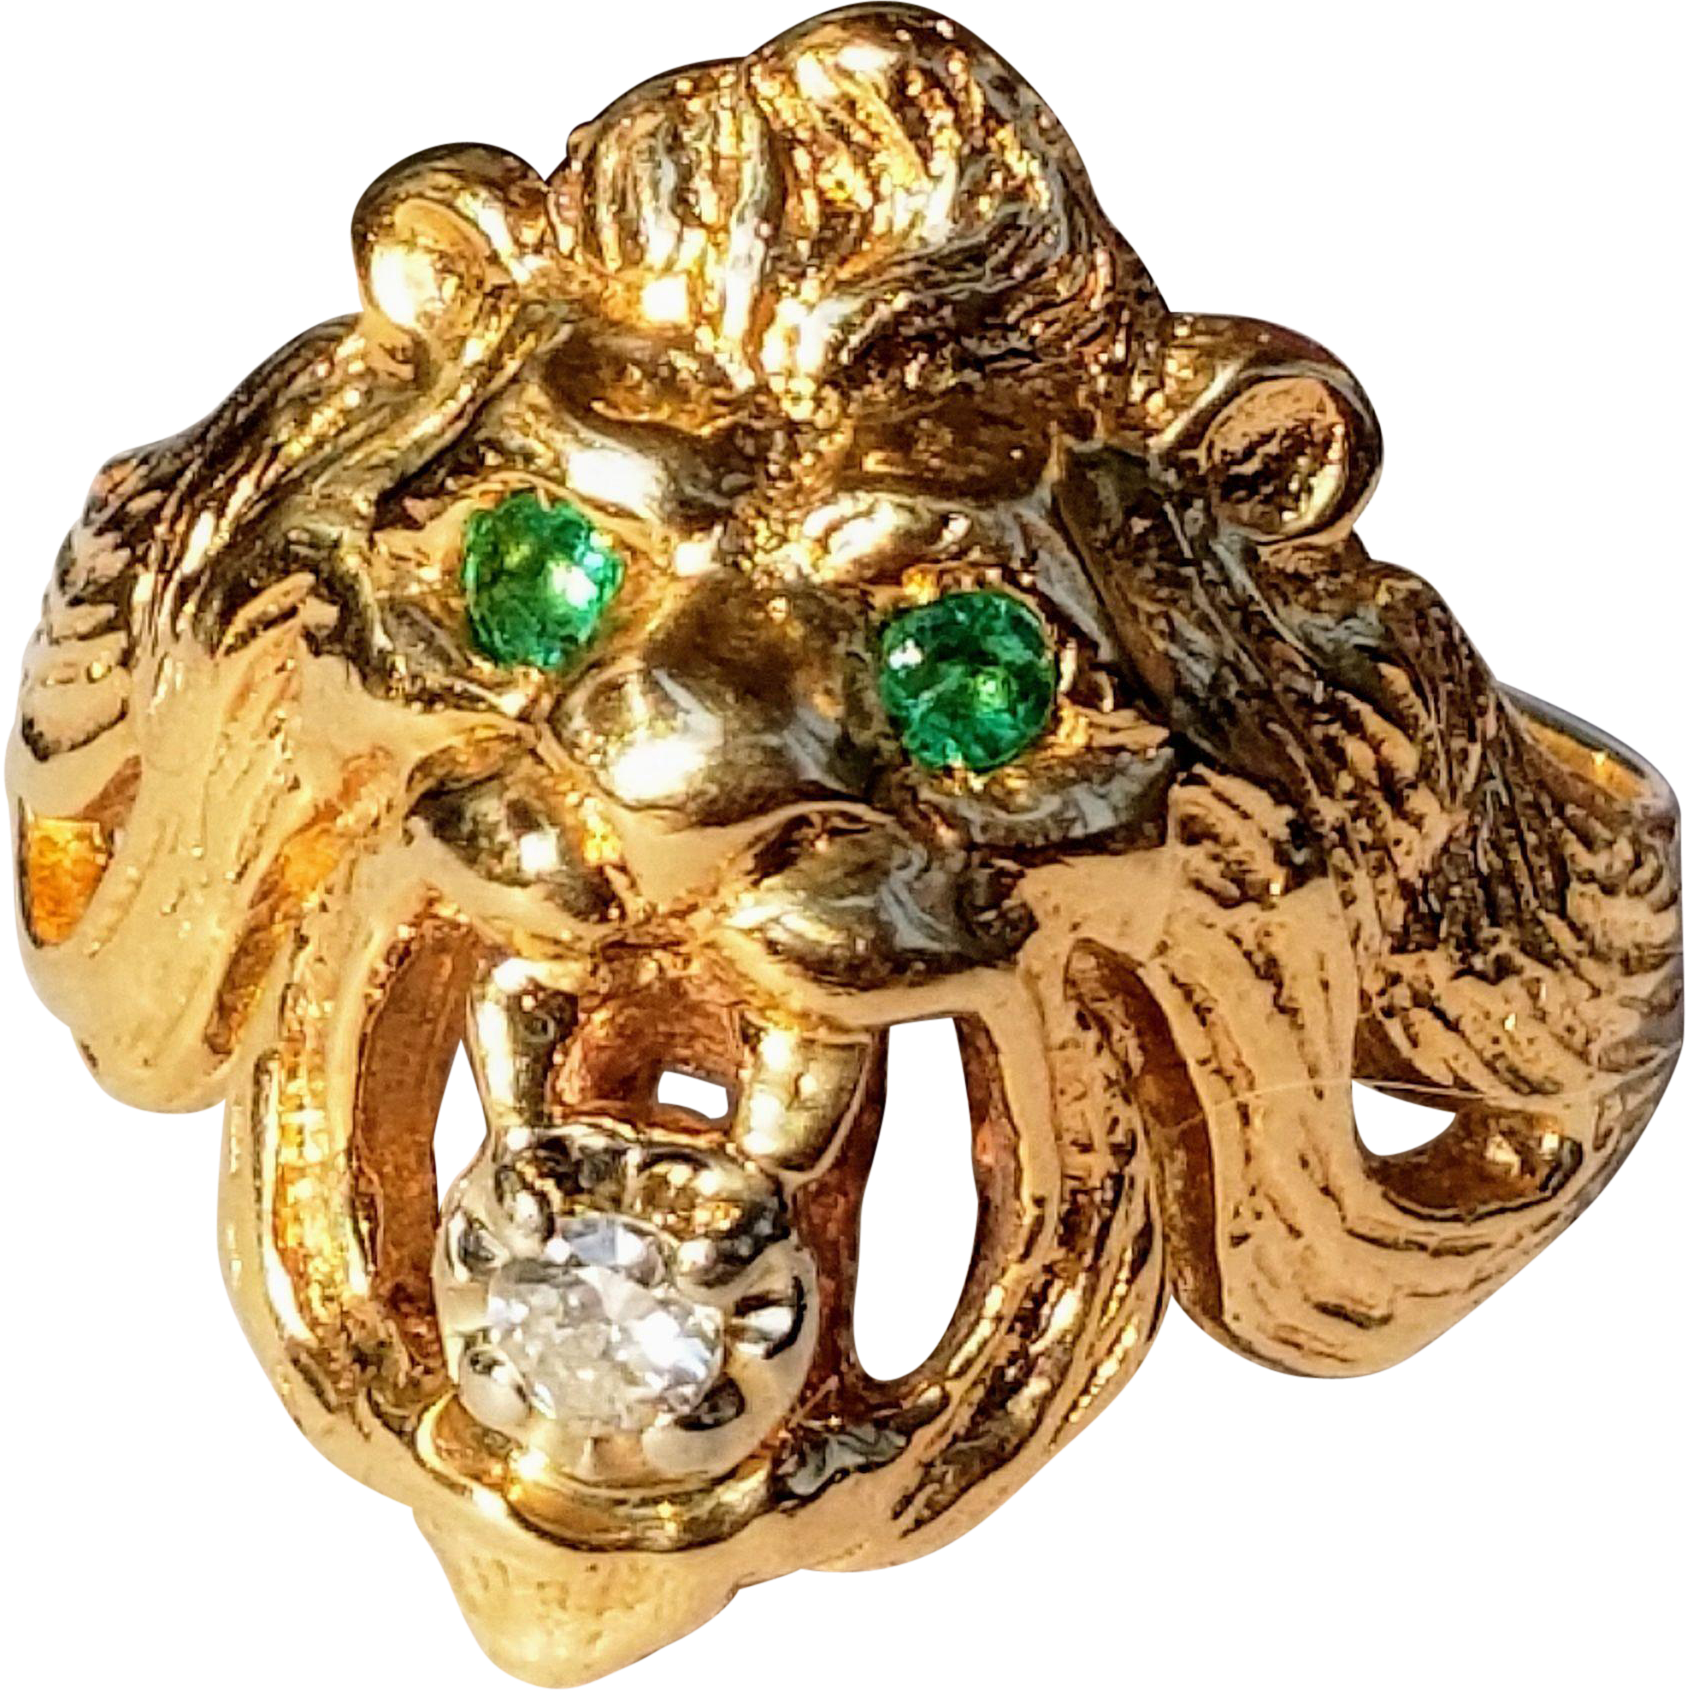 14K Quality Lions Head Ring Emerald Eyes Diamond Mouth 10.25